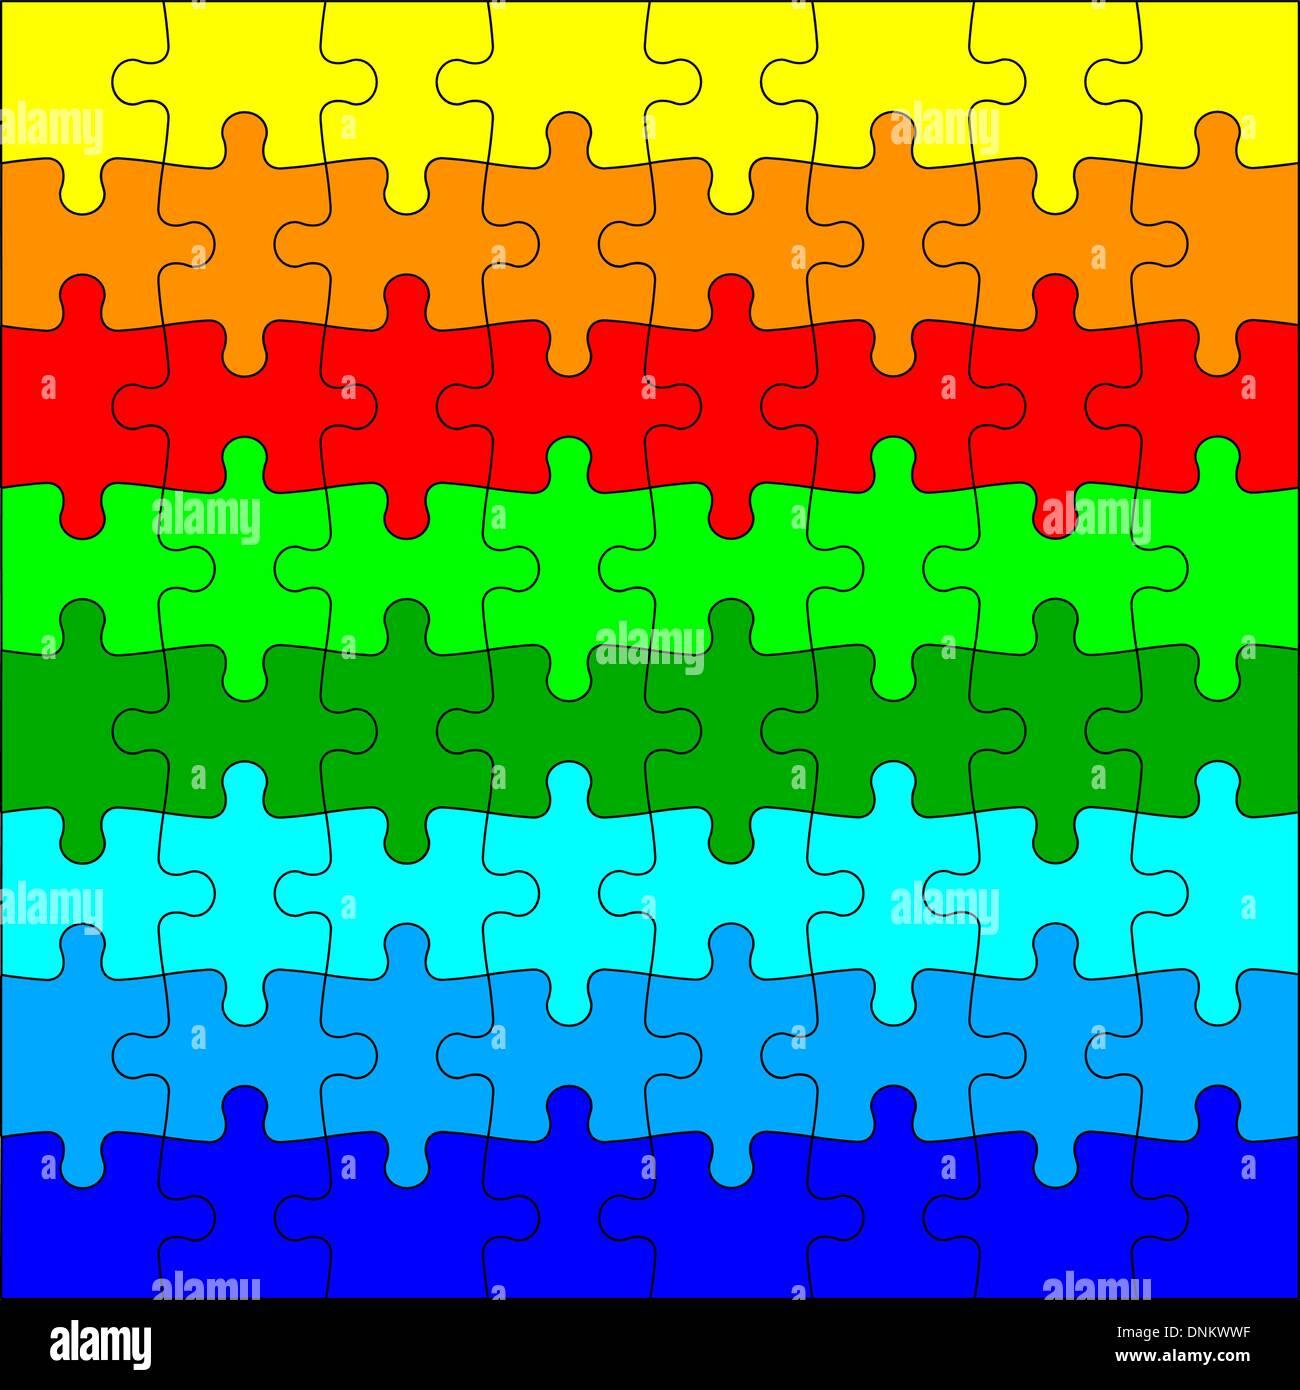 Background Vector Illustration jigsaw puzzle - Stock Image